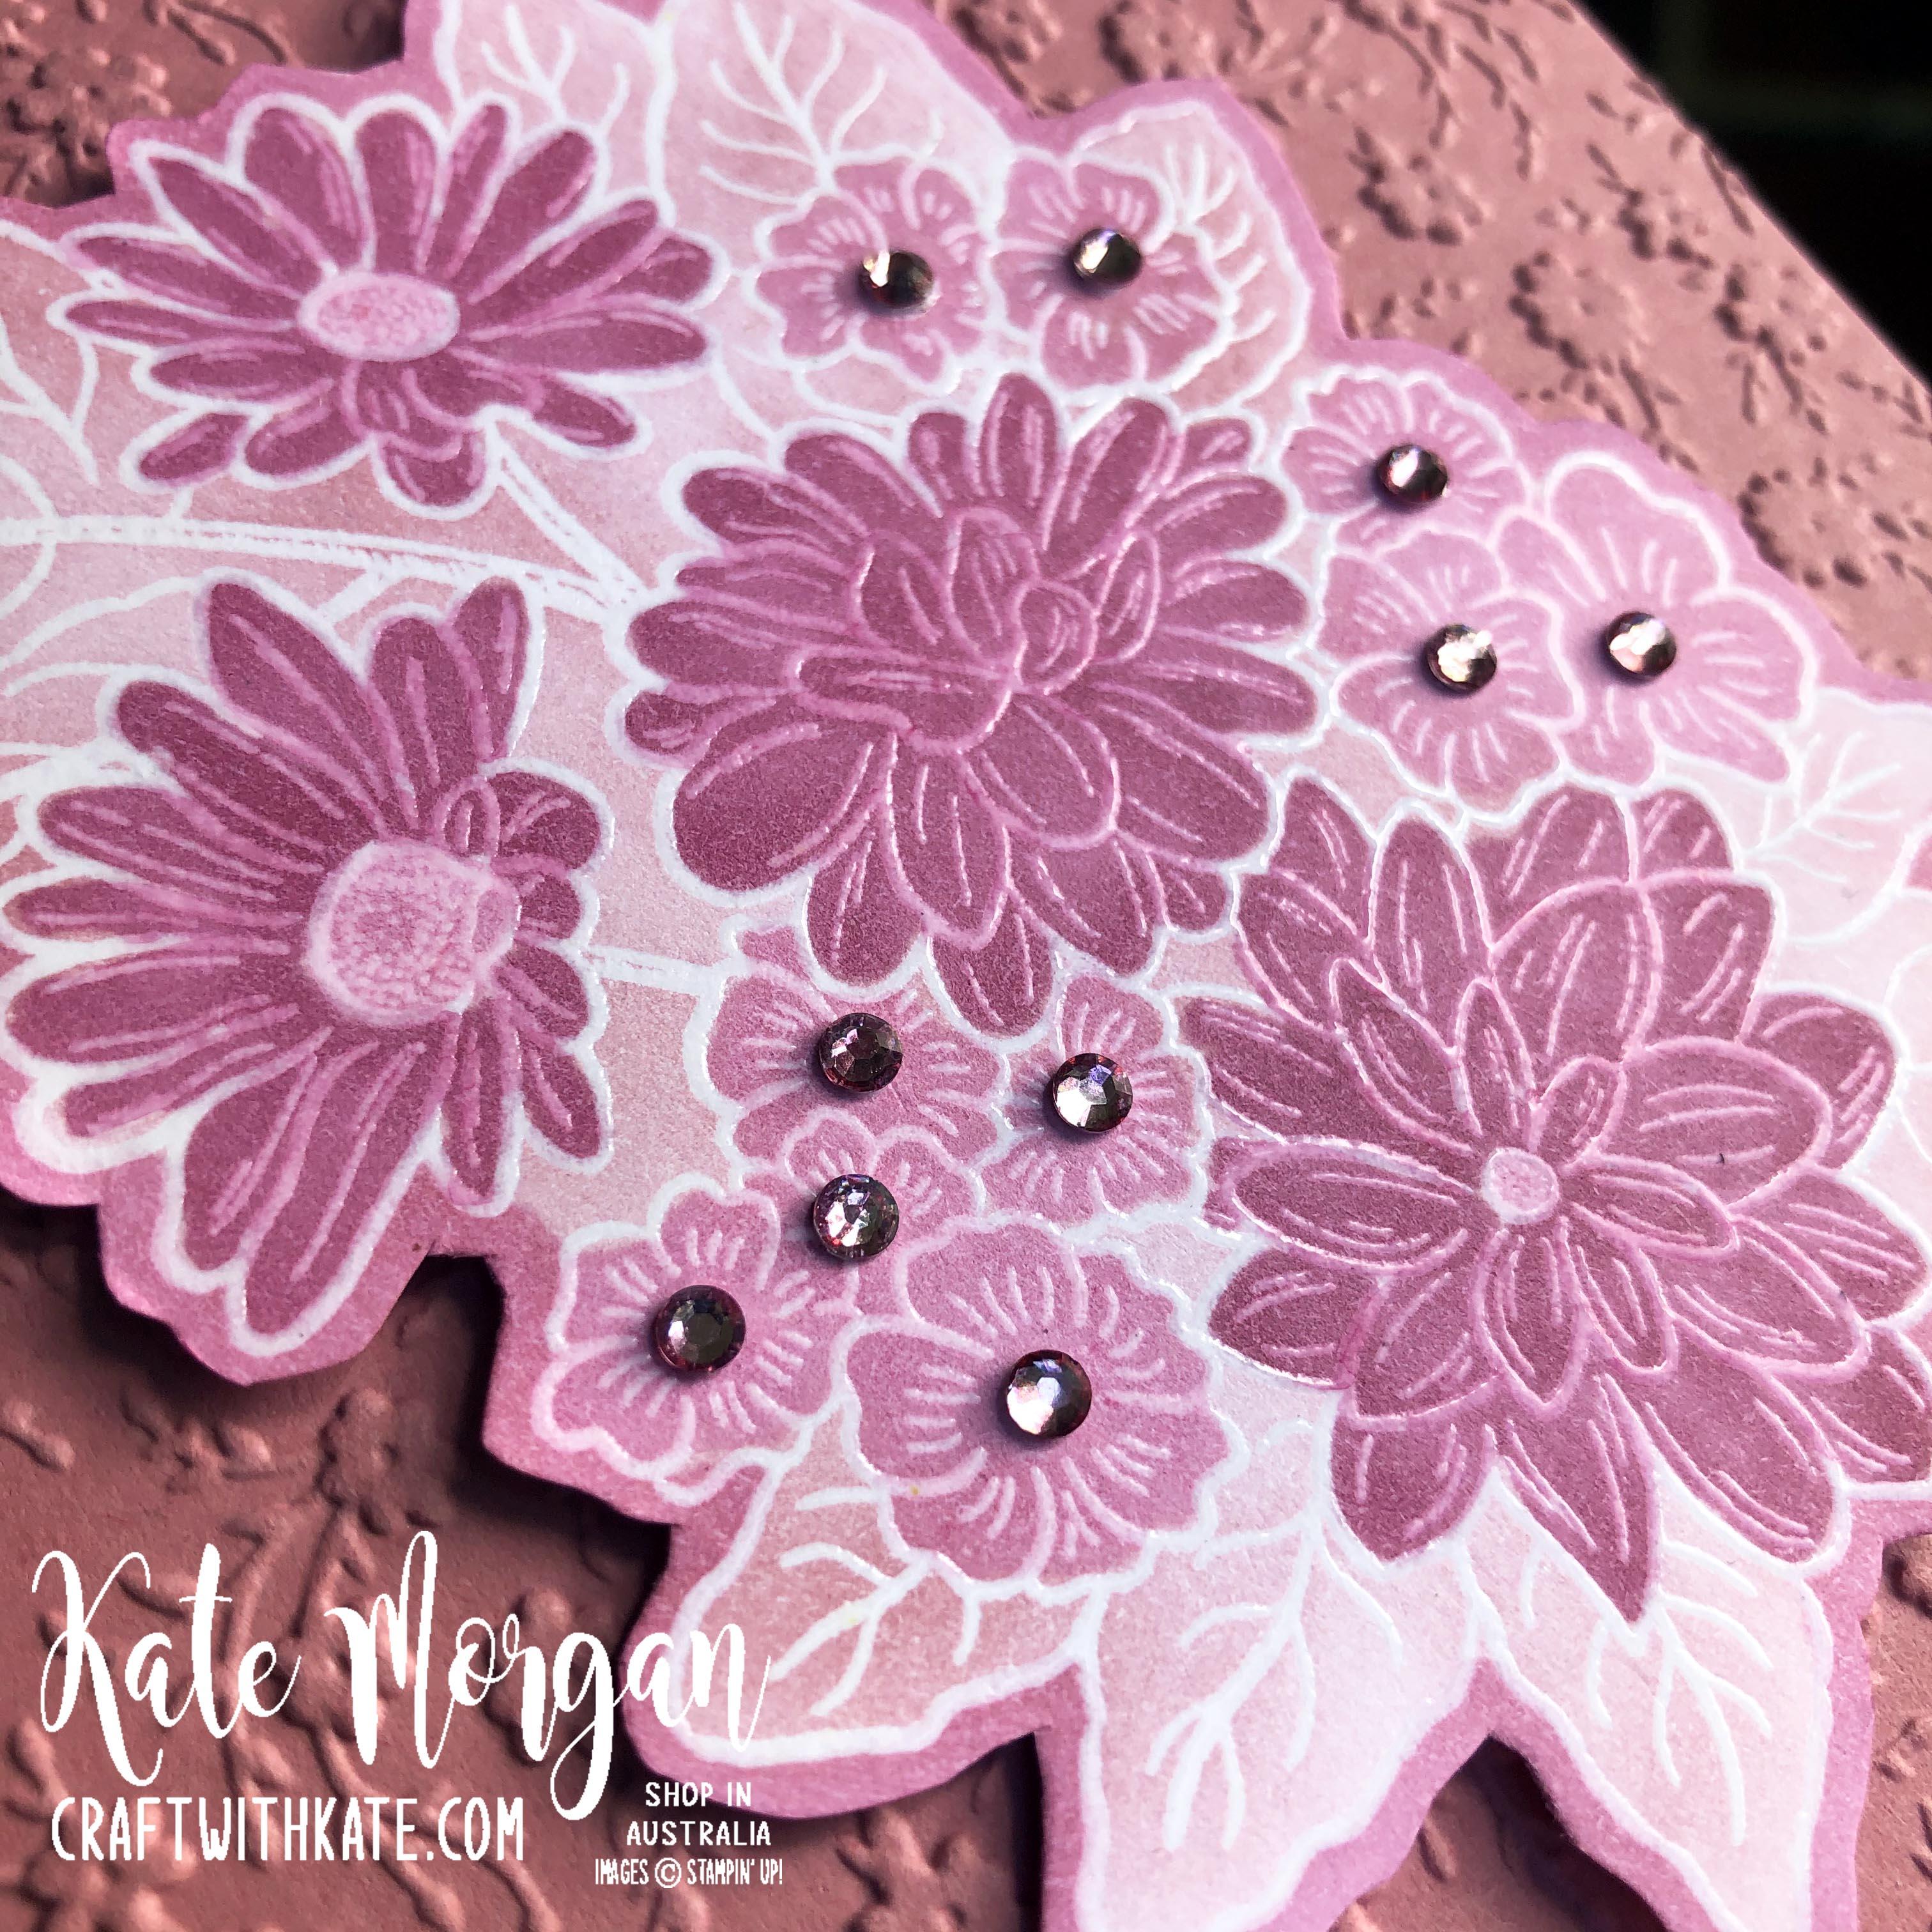 Monochrome Ornate Style Feminine card Stampin Up 2020 by Kate Morgan, Australia s